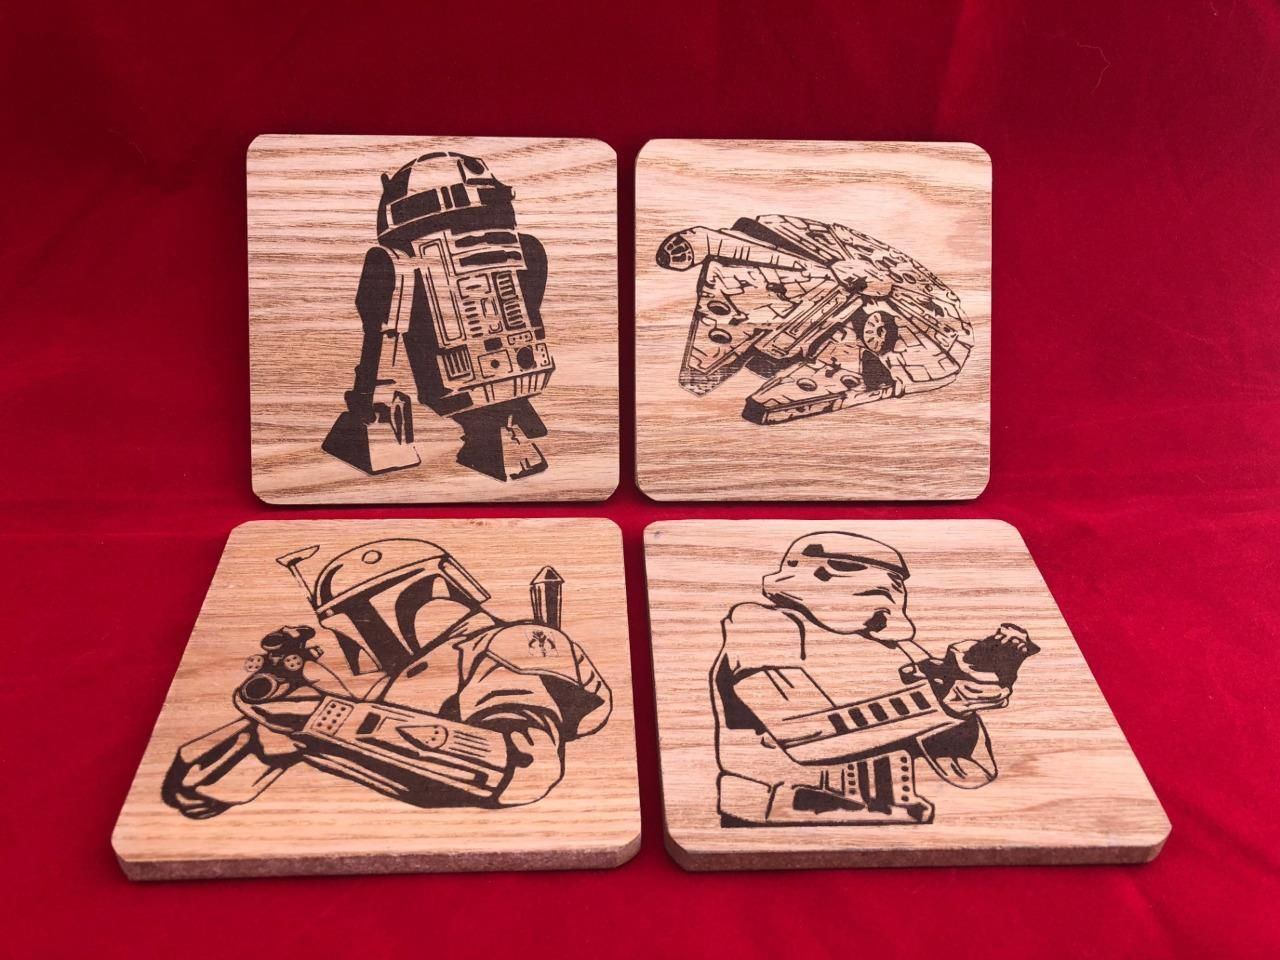 STAR WARS Wooden Coaster set - CNC Laser engraved - Boba Fett R2D2  Stormtrooper  a77966c3a